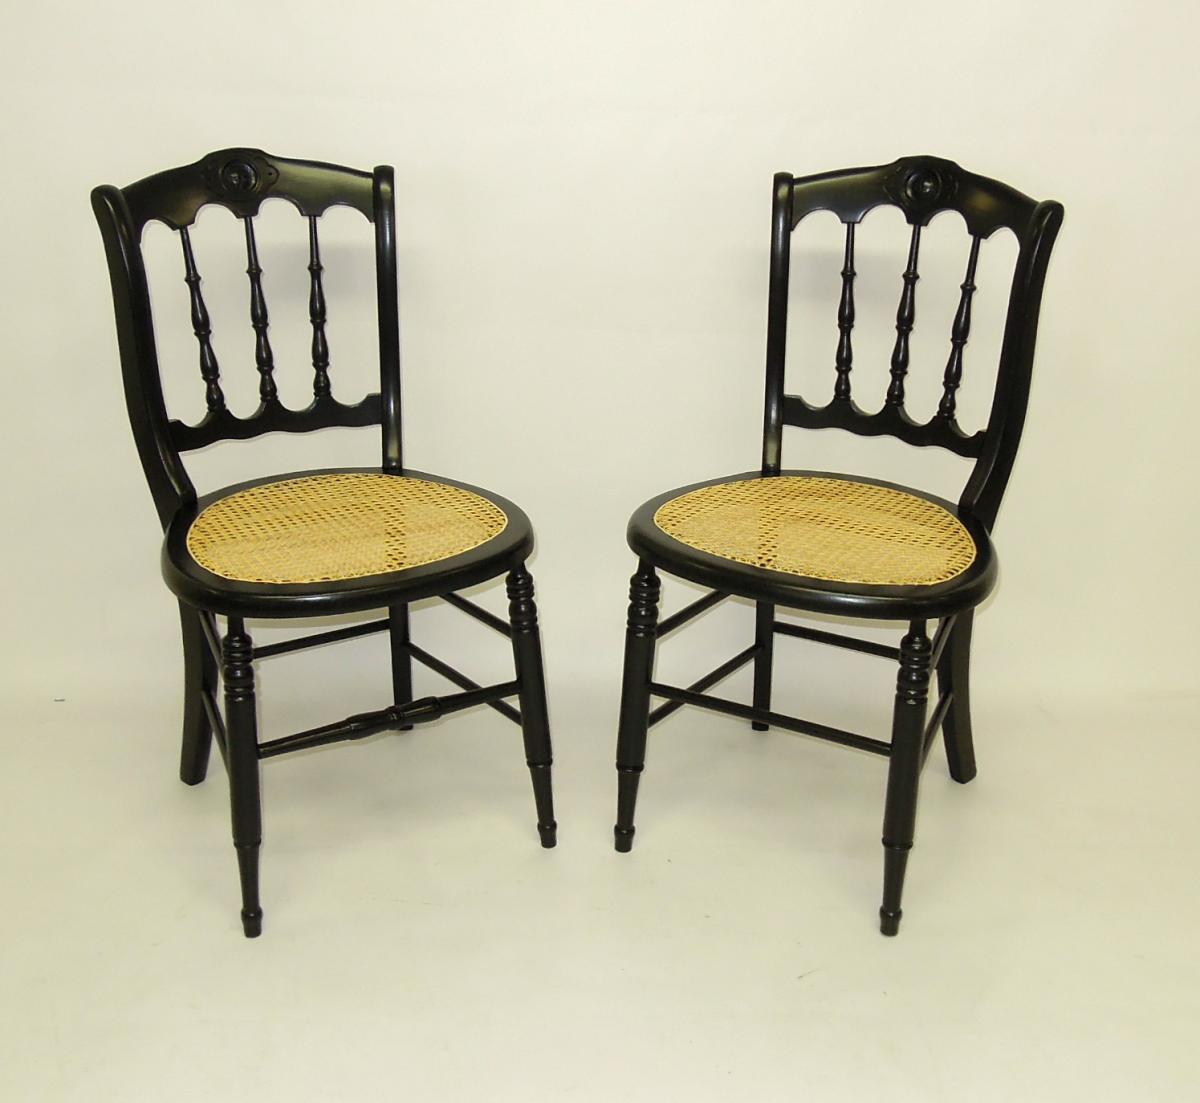 vinyl wicker chairs chic office fabulous kitchens | mod restoration